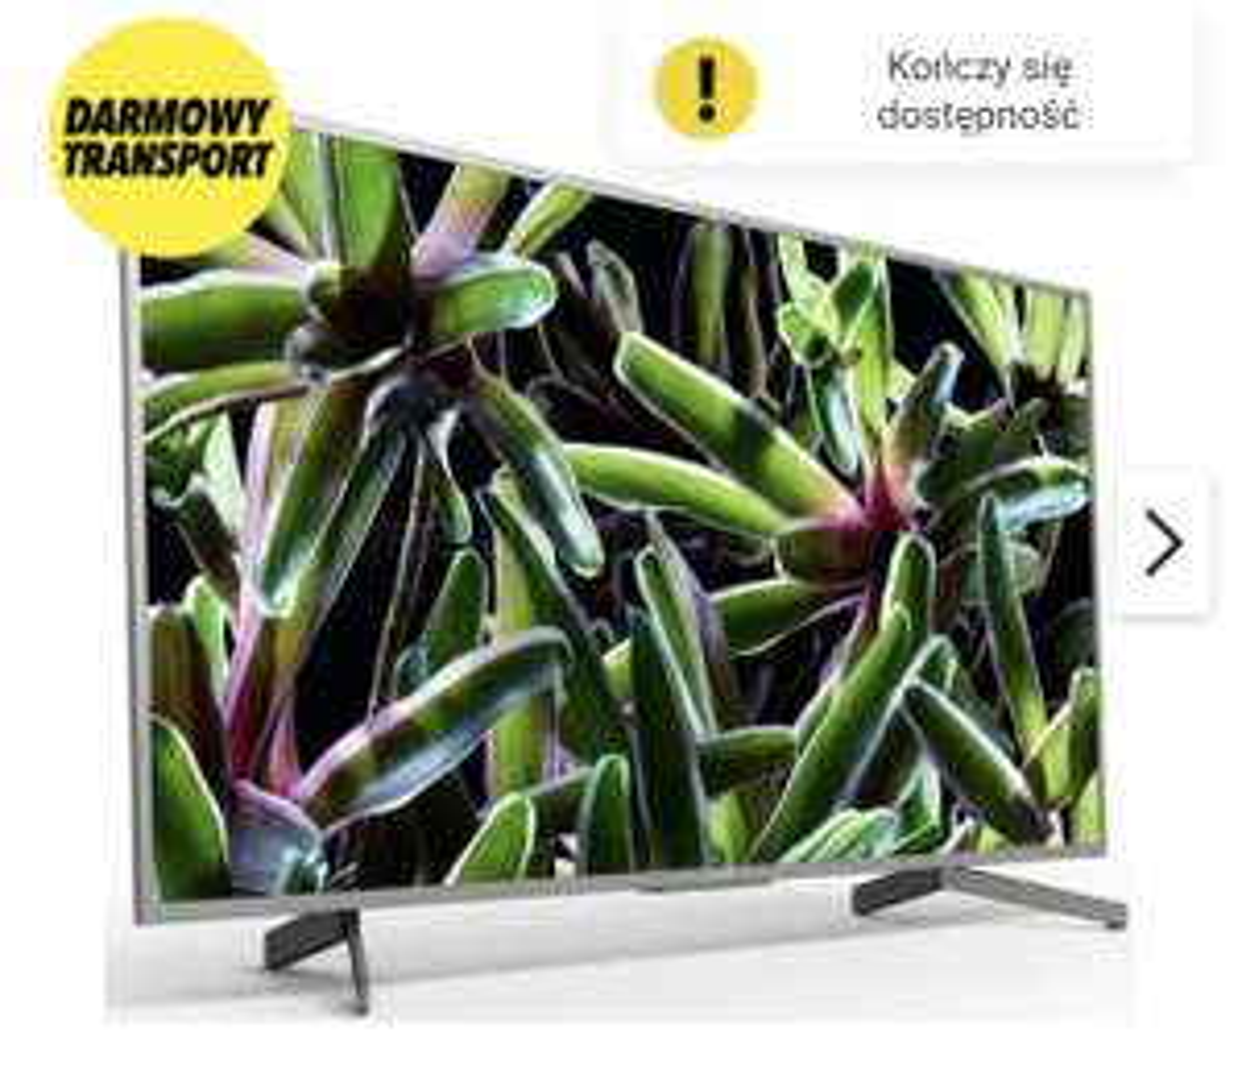 Telewizor SONY LED KD-65XG7077